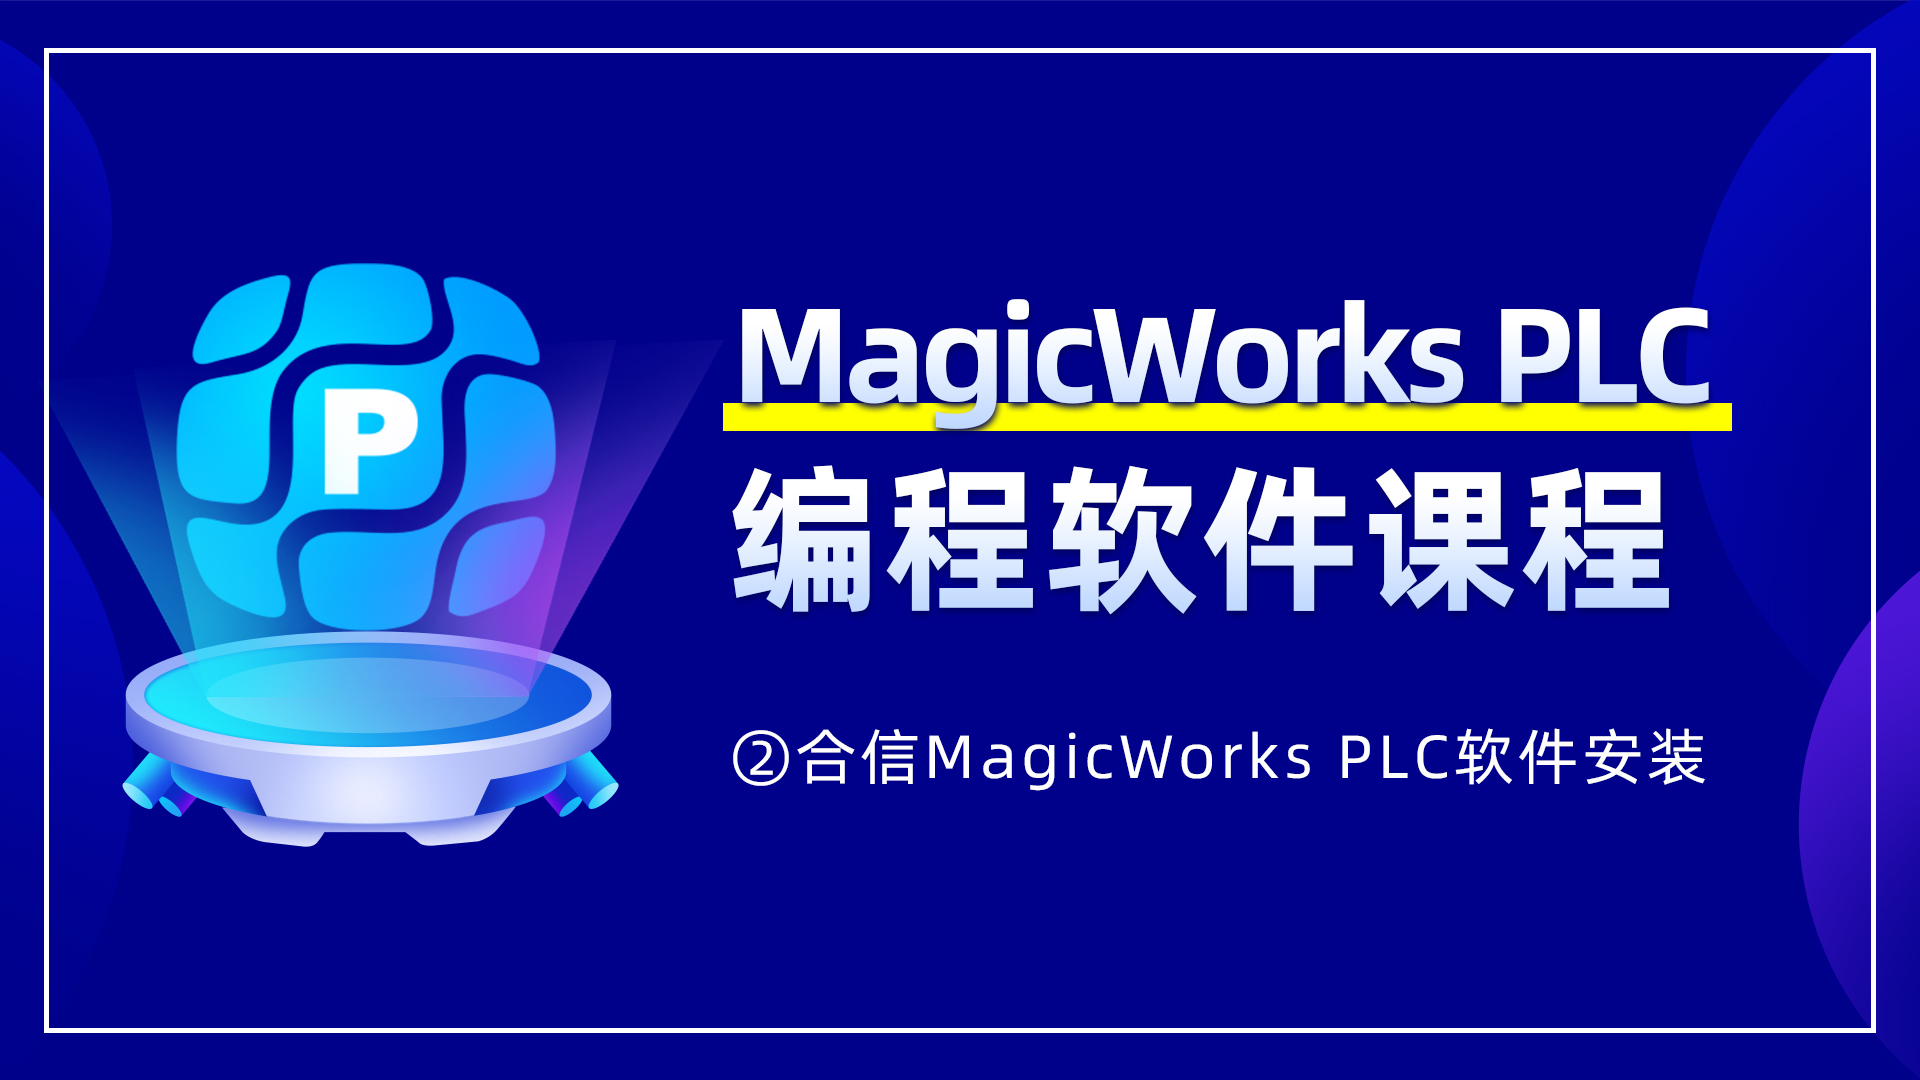 2. 合信MagicWorks PLC软件安装